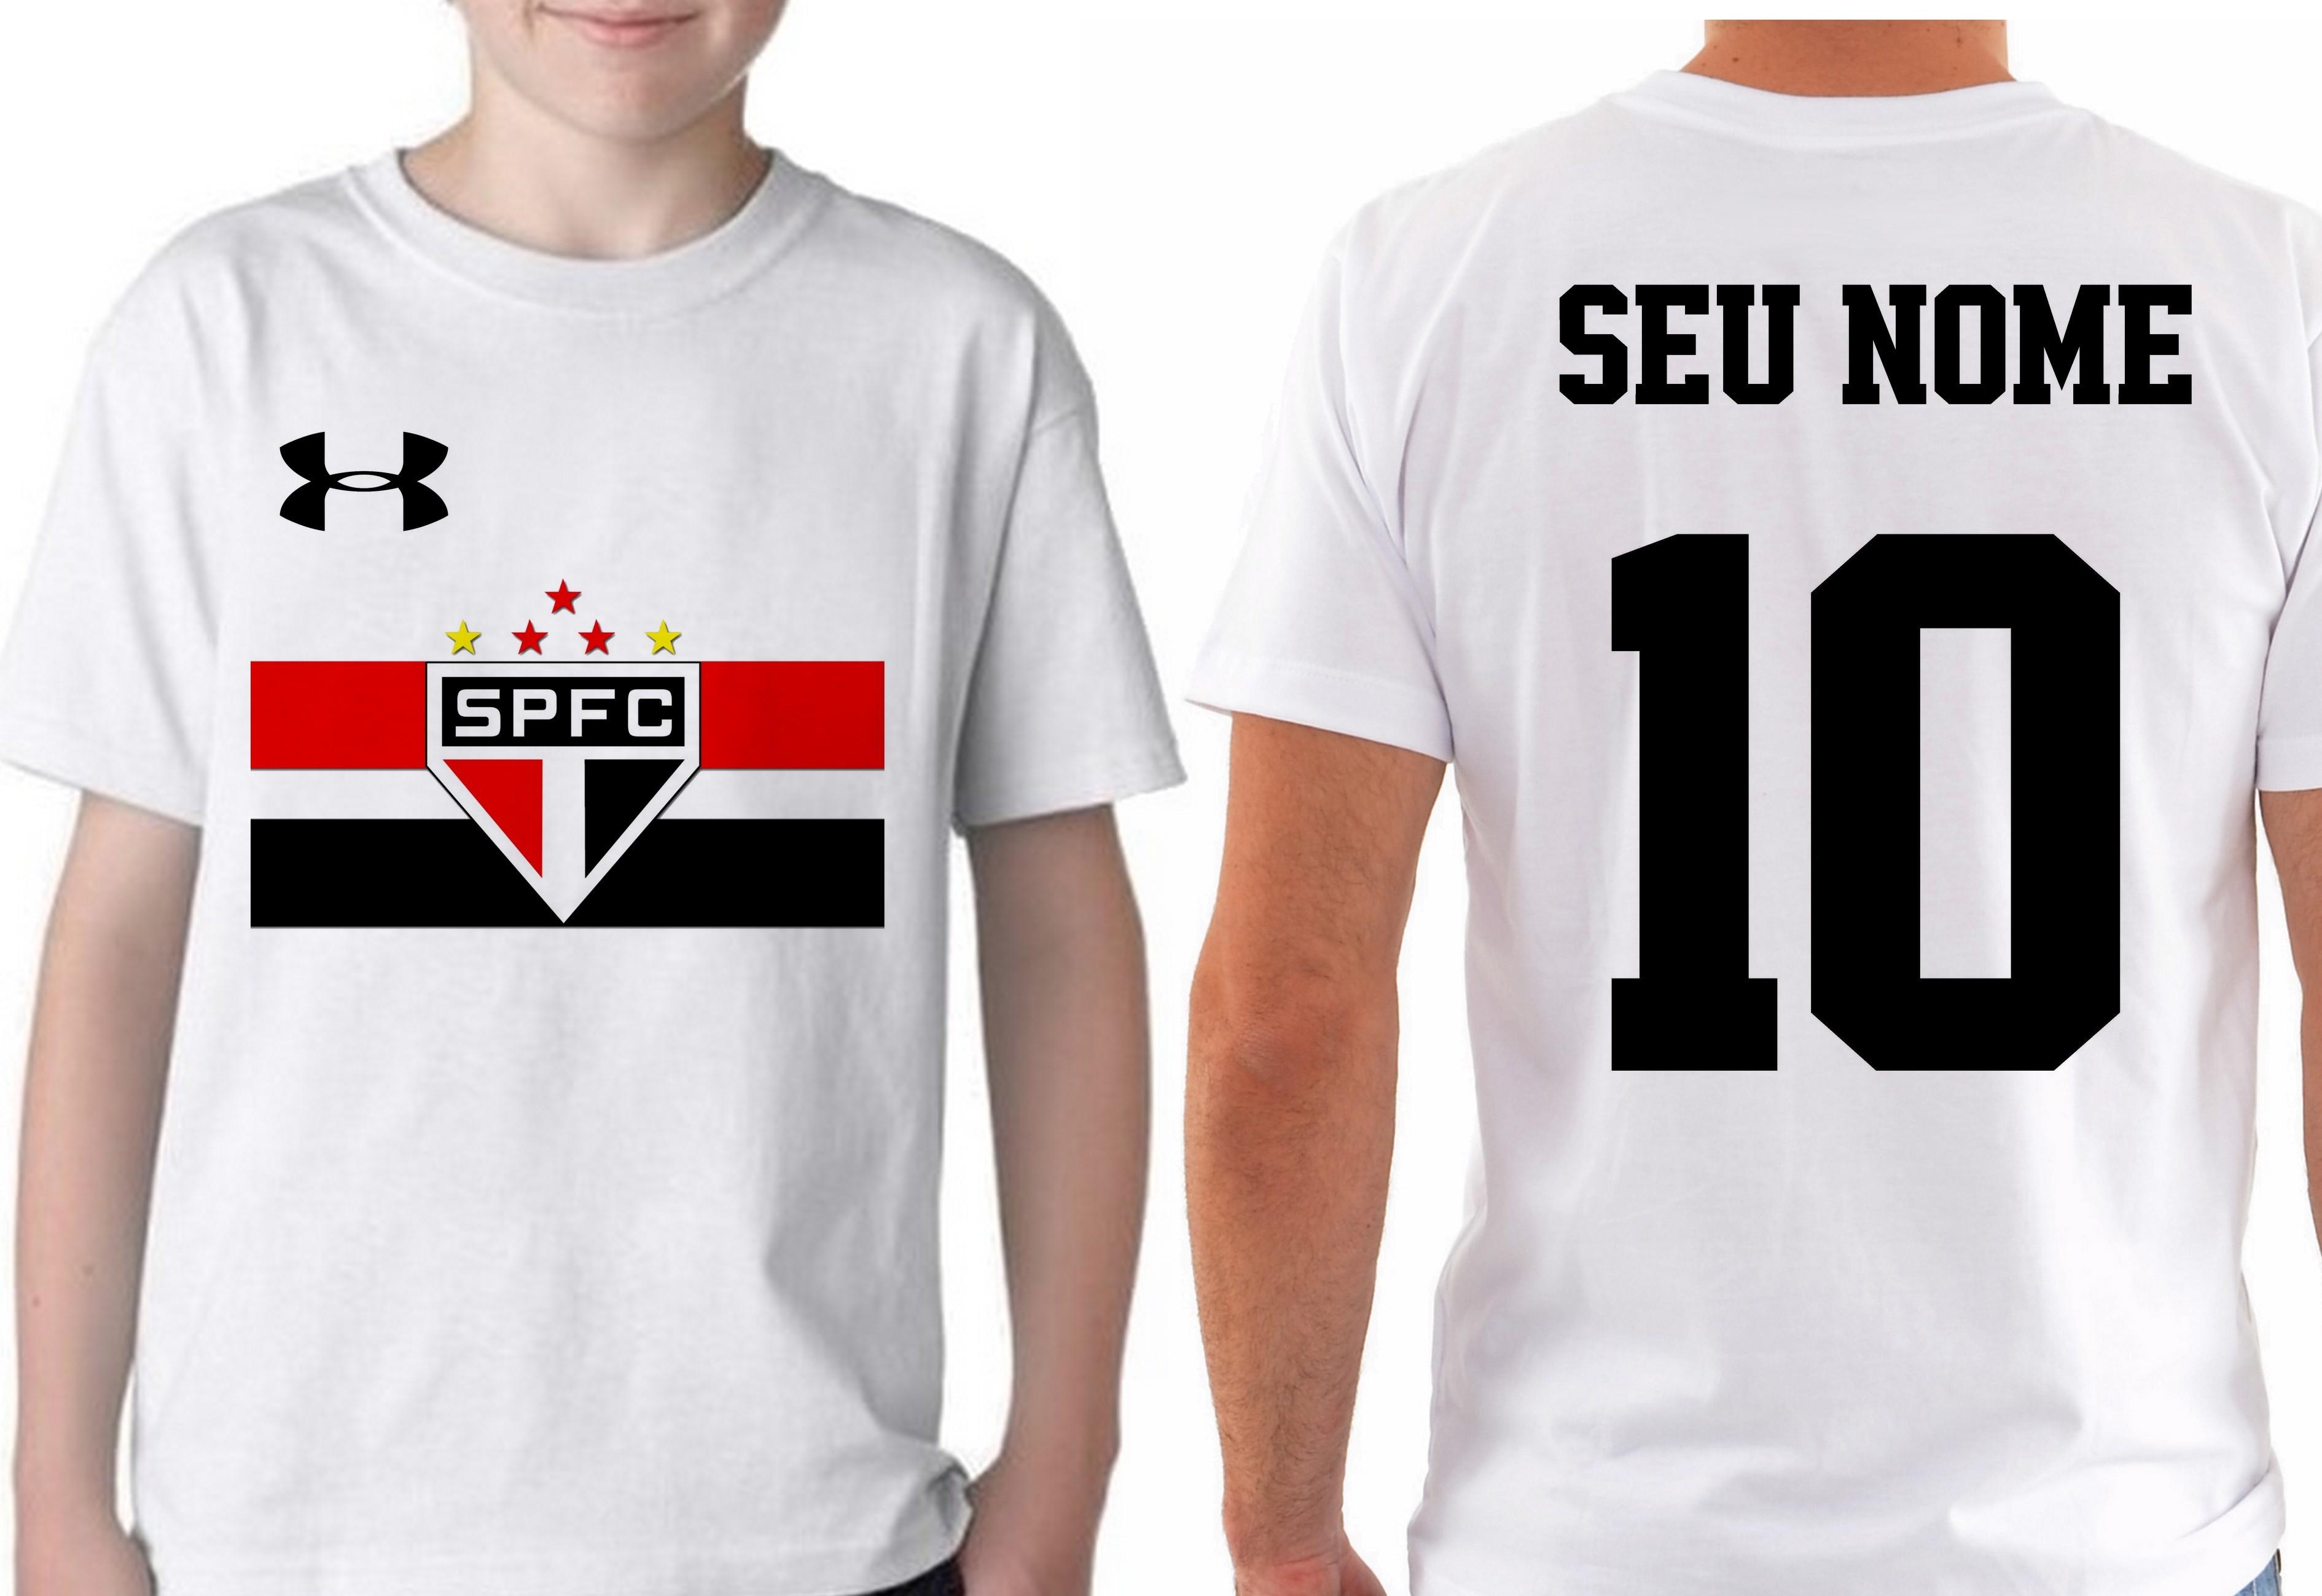 Camiseta Infantil Blusa Crianca Nome Personalizado Sao Paulo  1ad45ea913875